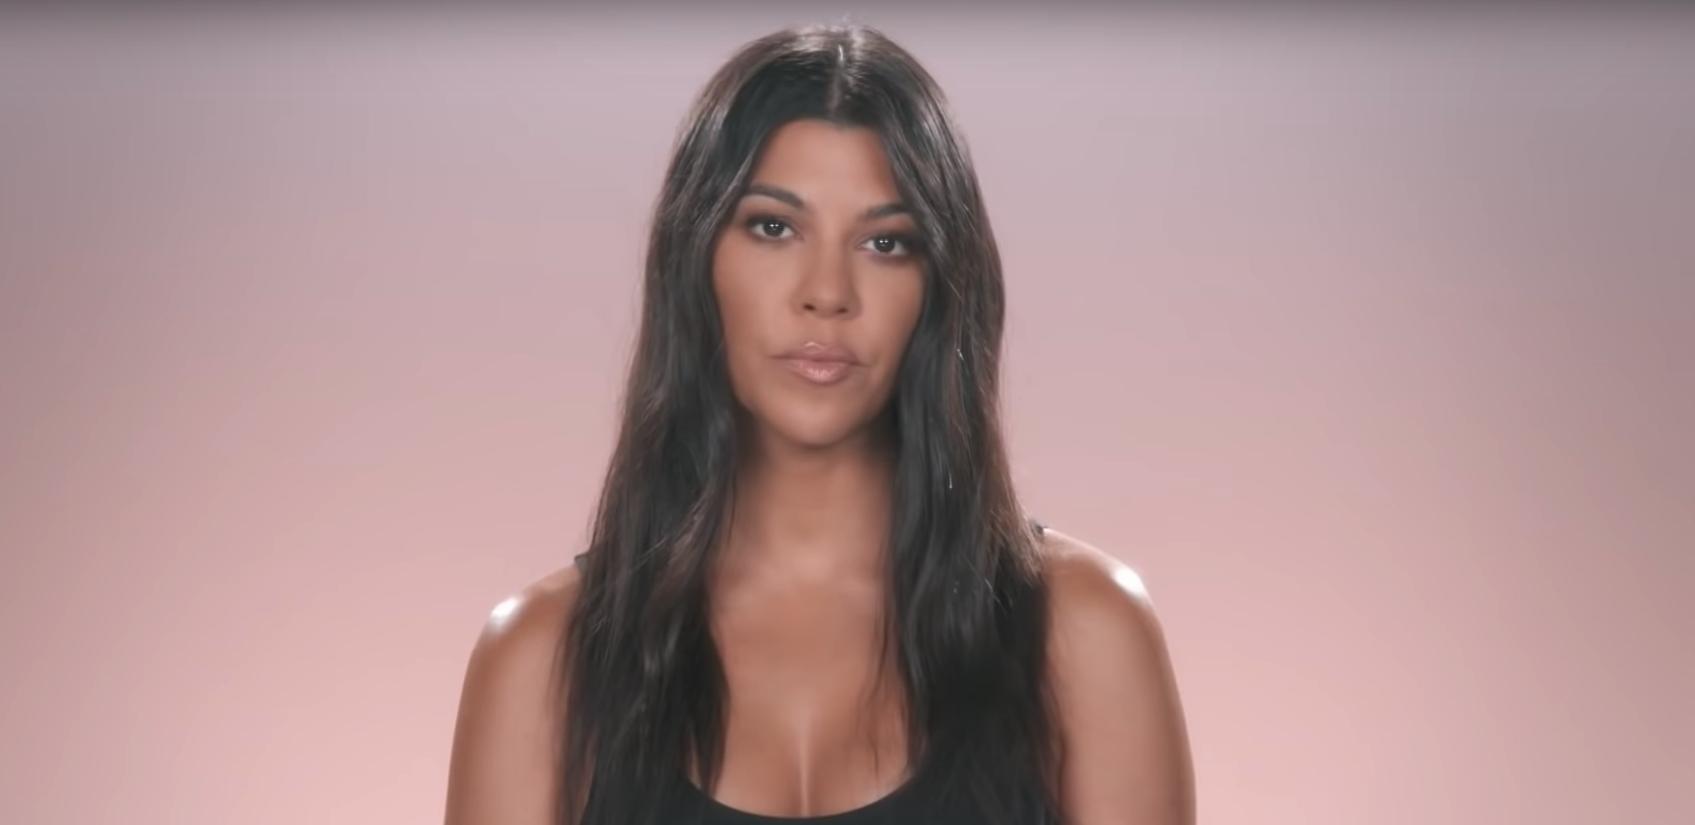 Kourtney Kardashian Admits She 'Doesn't Need' a Man on 'KUWTK': 'I'm Content … With My Friends'